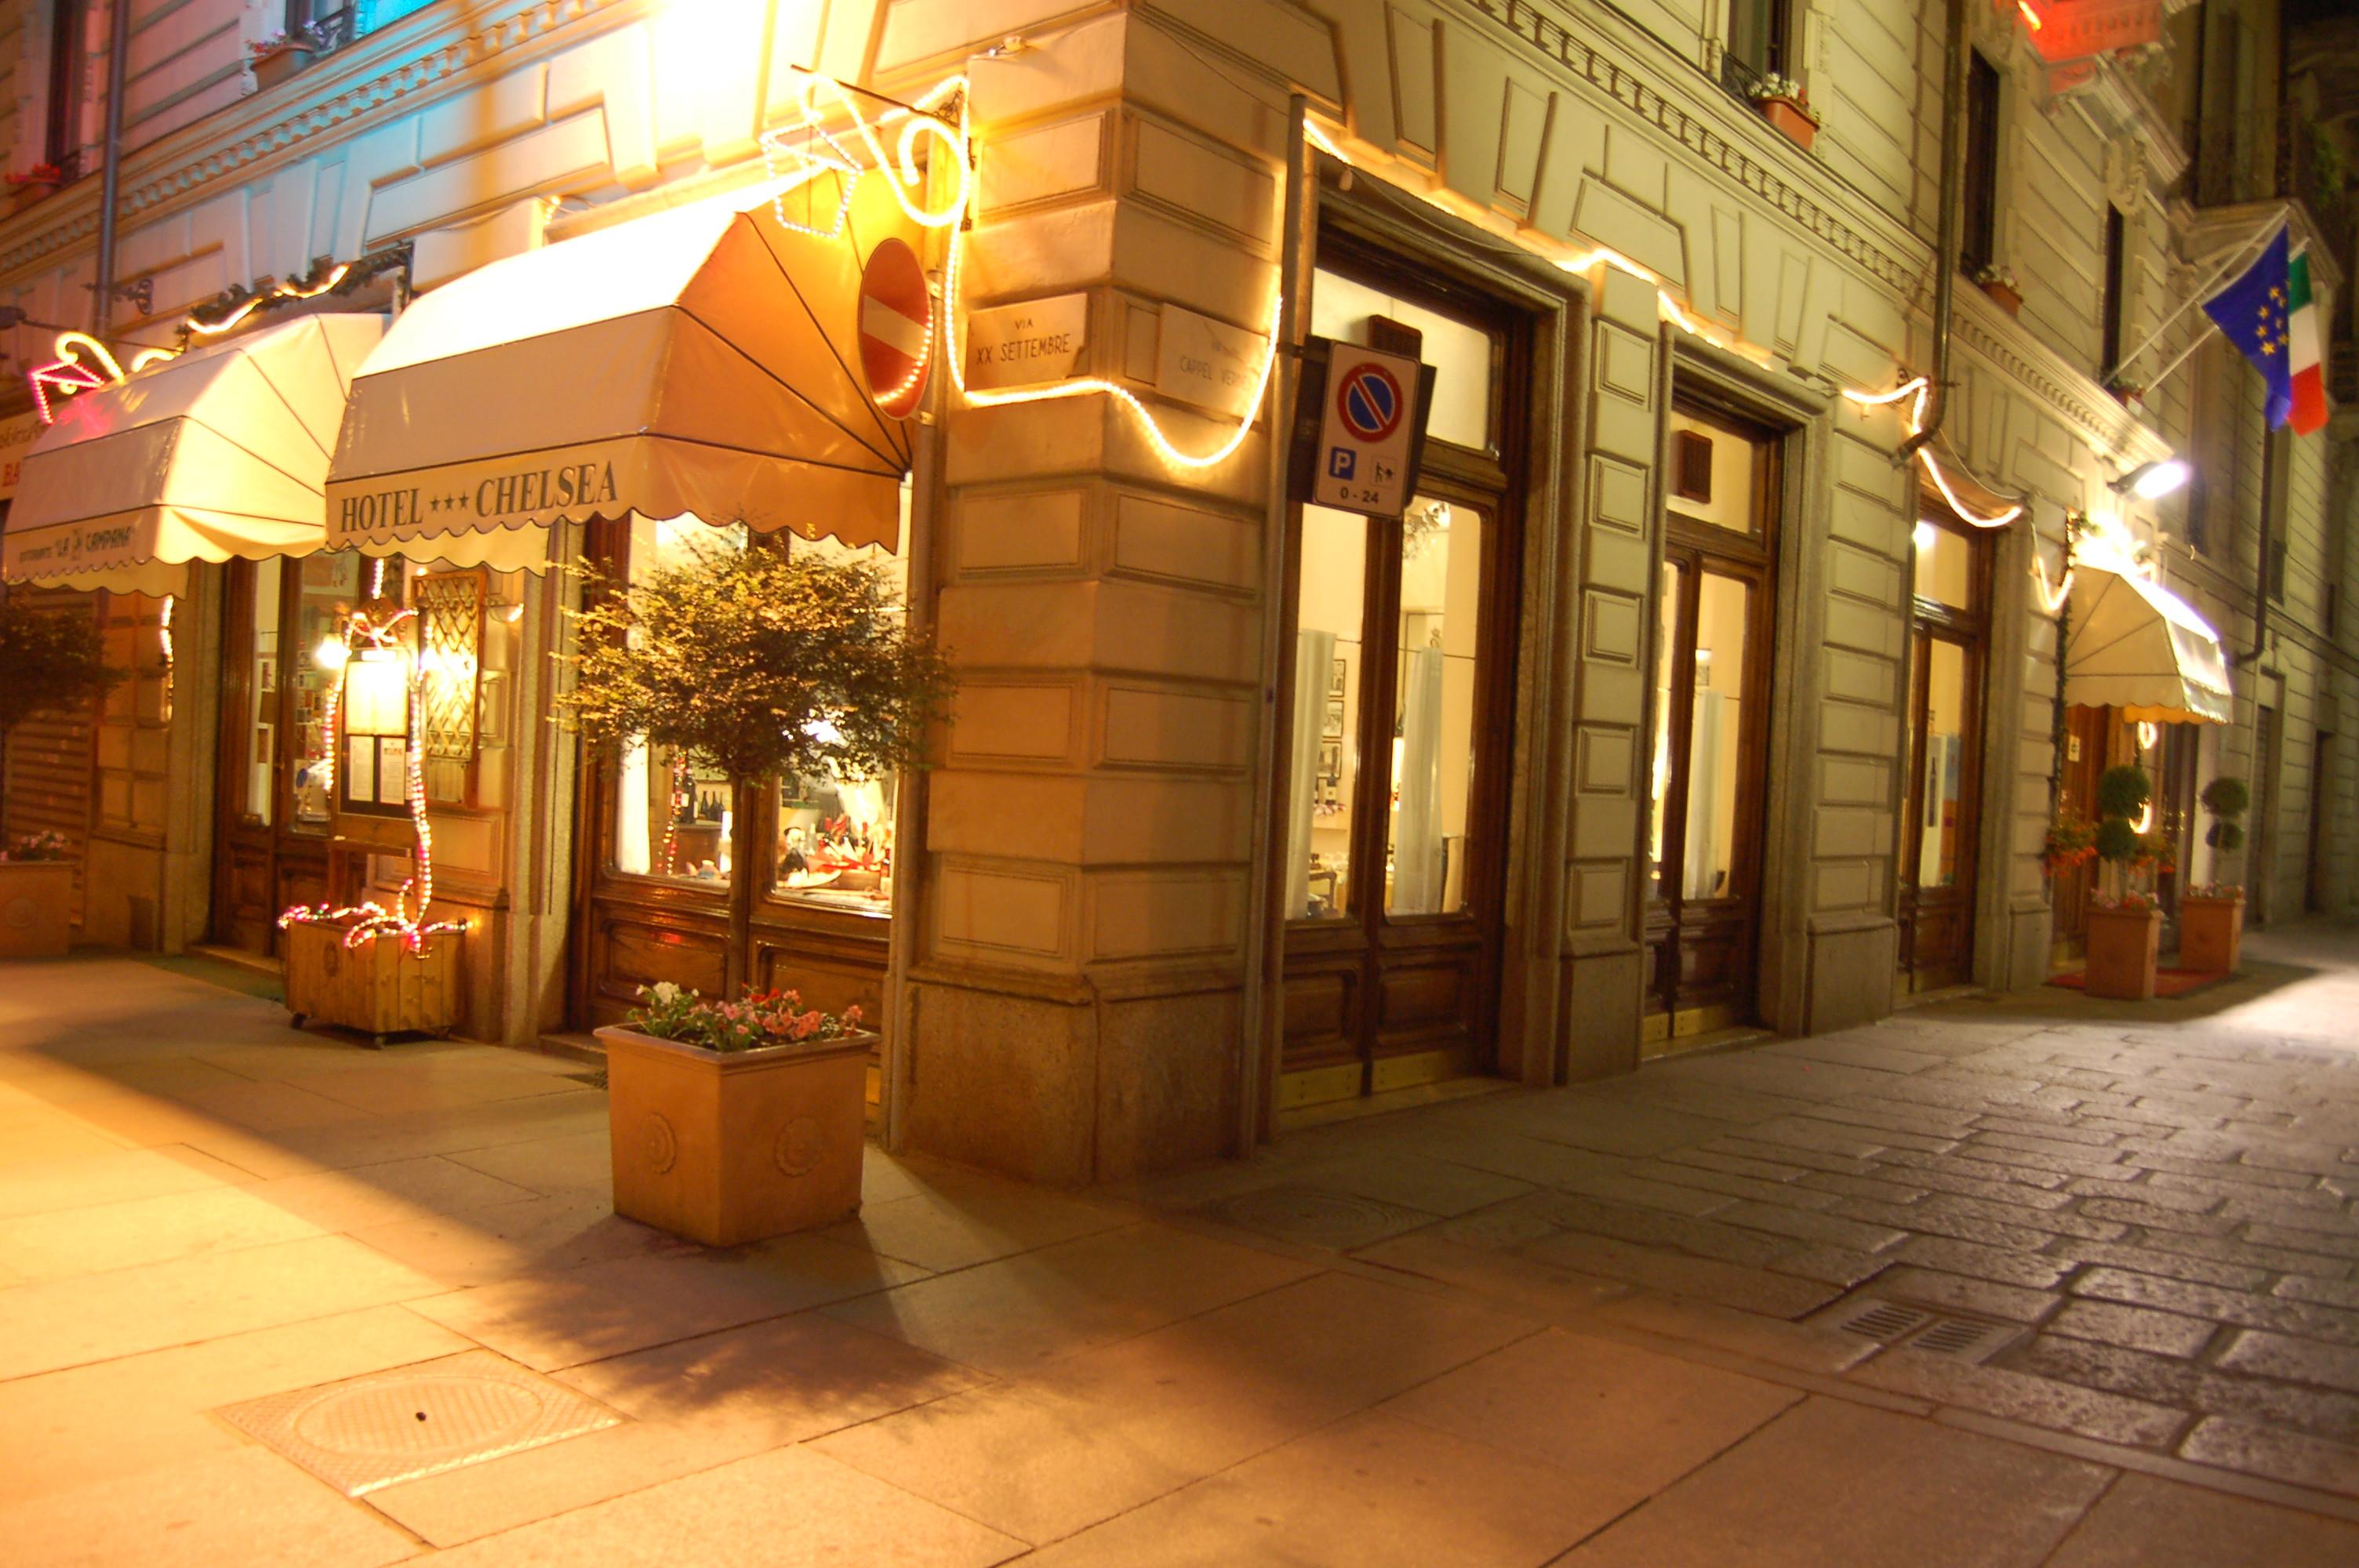 Hotel/Albergo, Ristorante per celiaci a Torino